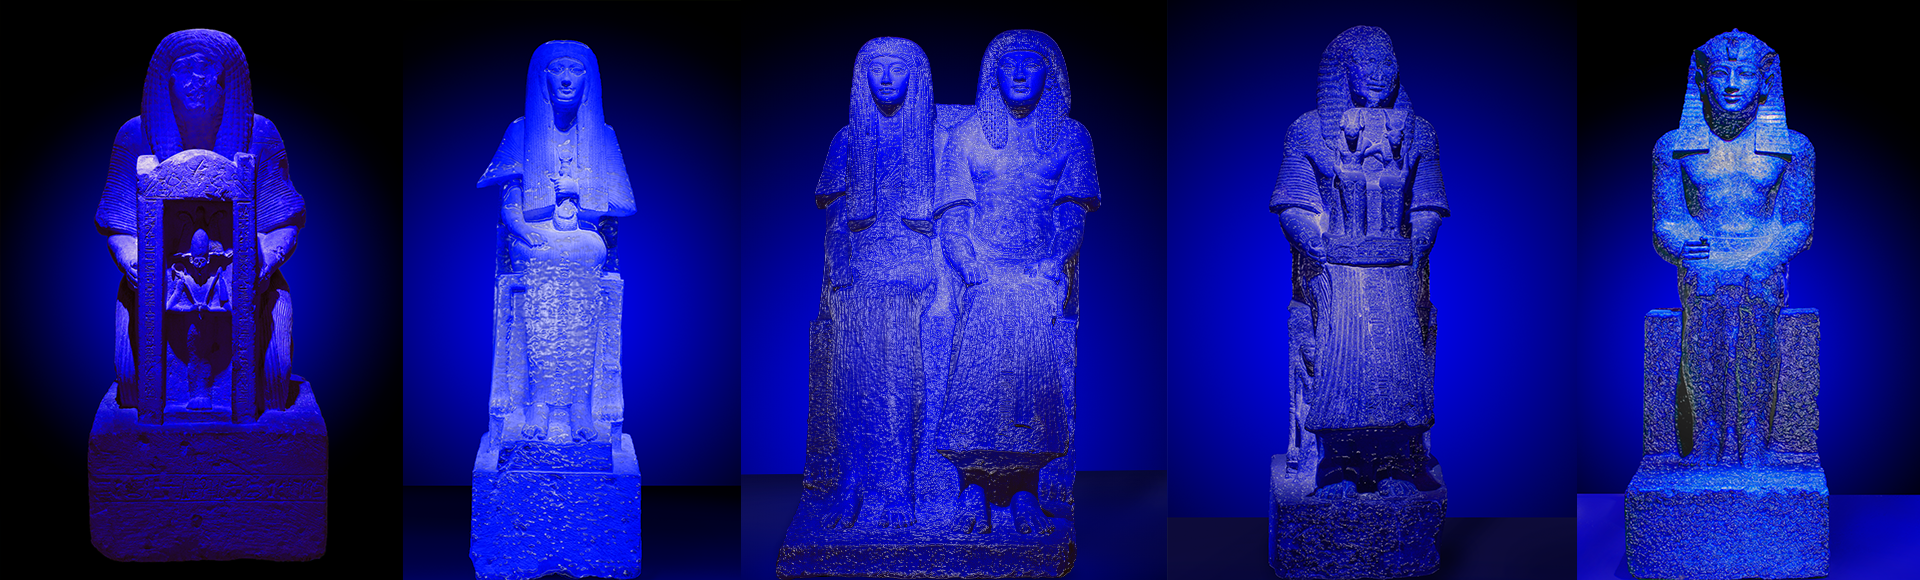 The glaze of lapis lazuli by Jeroen Spijker